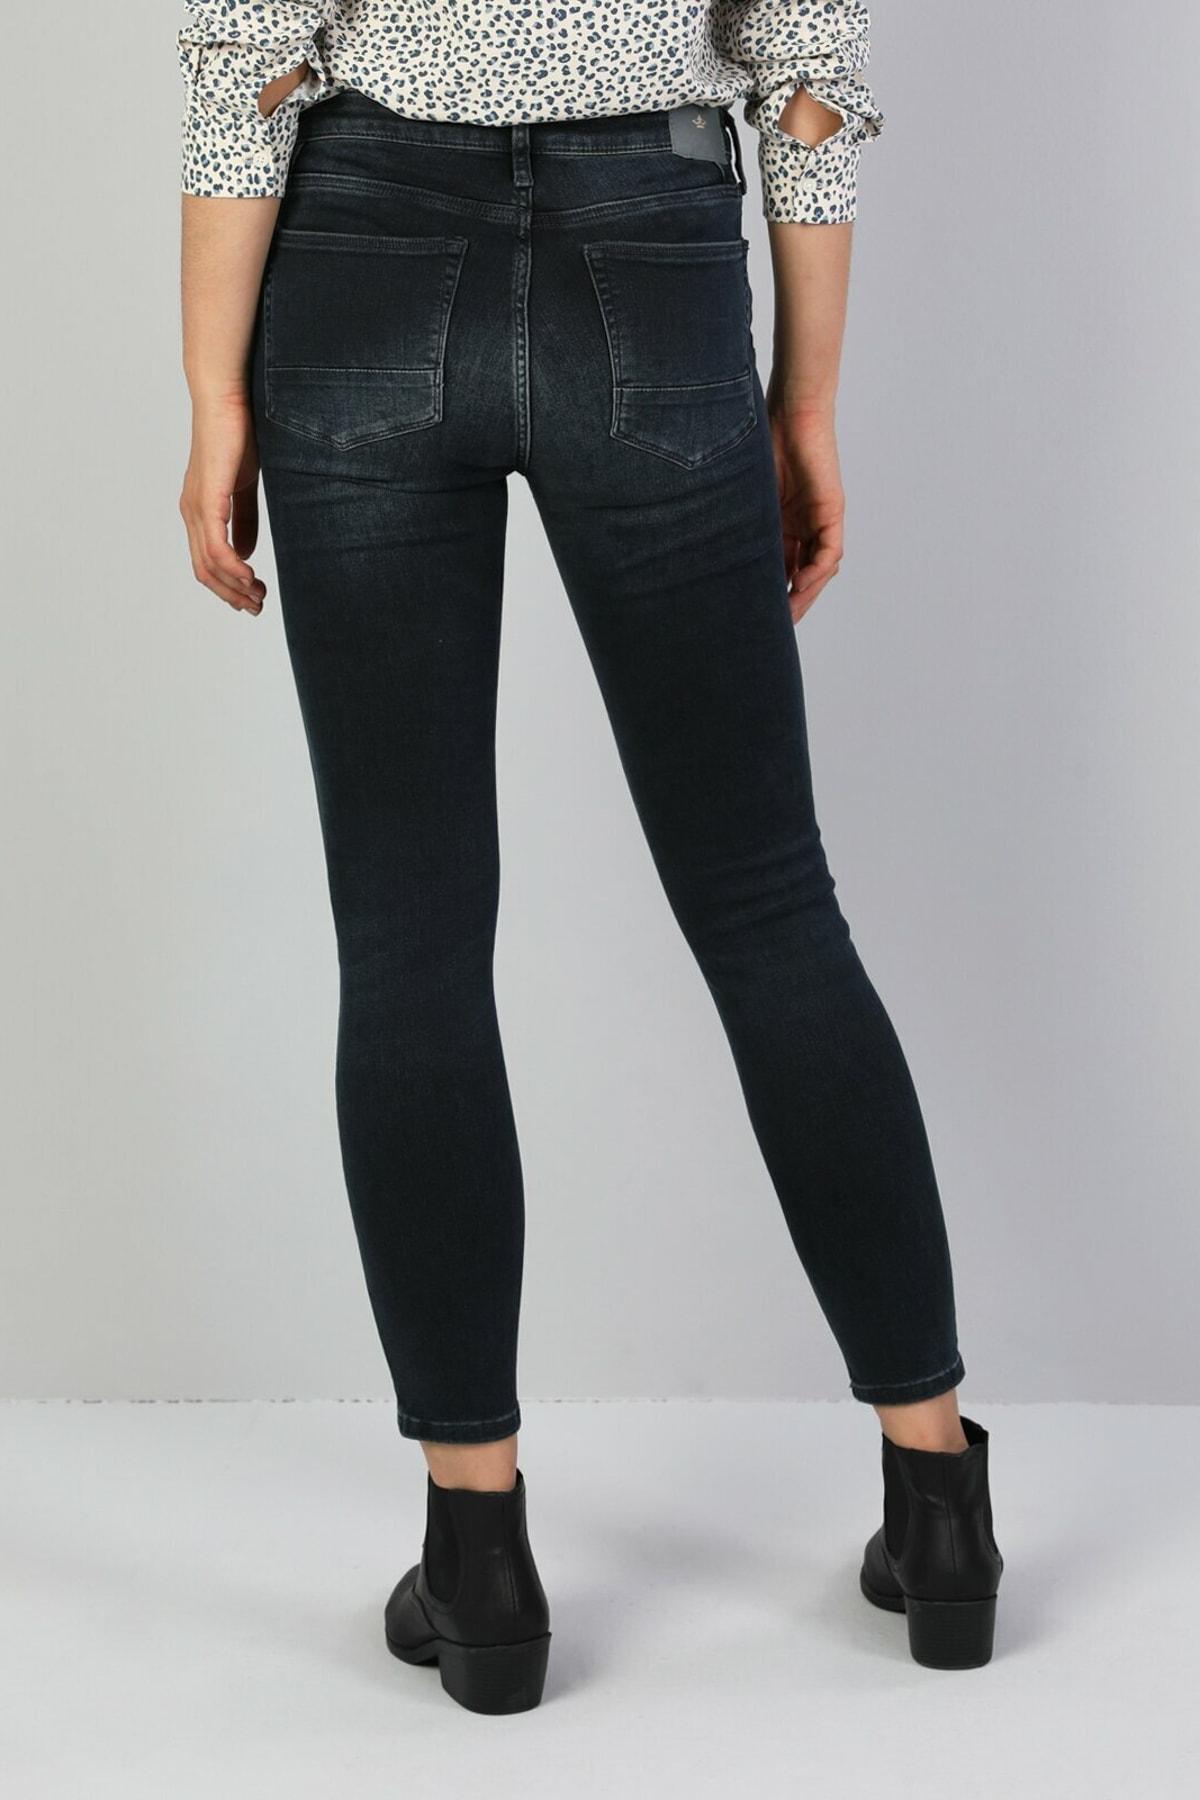 Colin's Kadın Jeans CL1047039 2